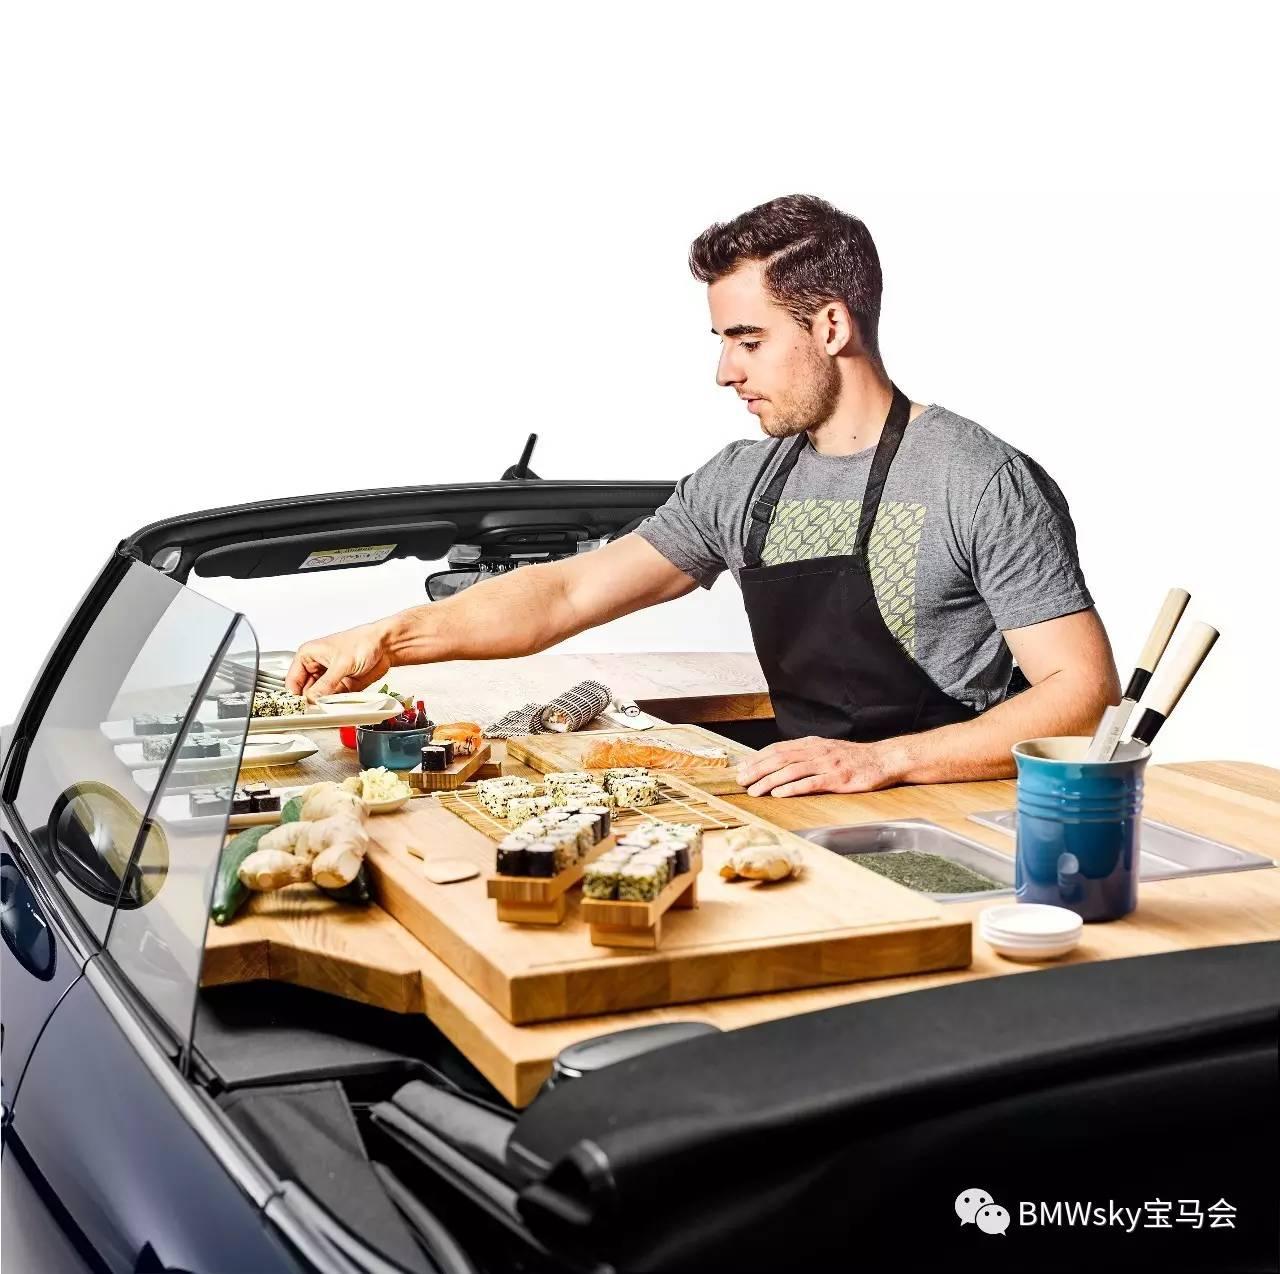 kitchen prep cart play accessories bmw推出 全新mini 移动厨房 搜狐汽车 搜狐网 mini商务创新部门负责人表示 街边食品能很好地补充普通餐厅的不足 顾客可以方便地看到实物准备的过程 购买也很方便 然而 传统食品货车太大太笨重